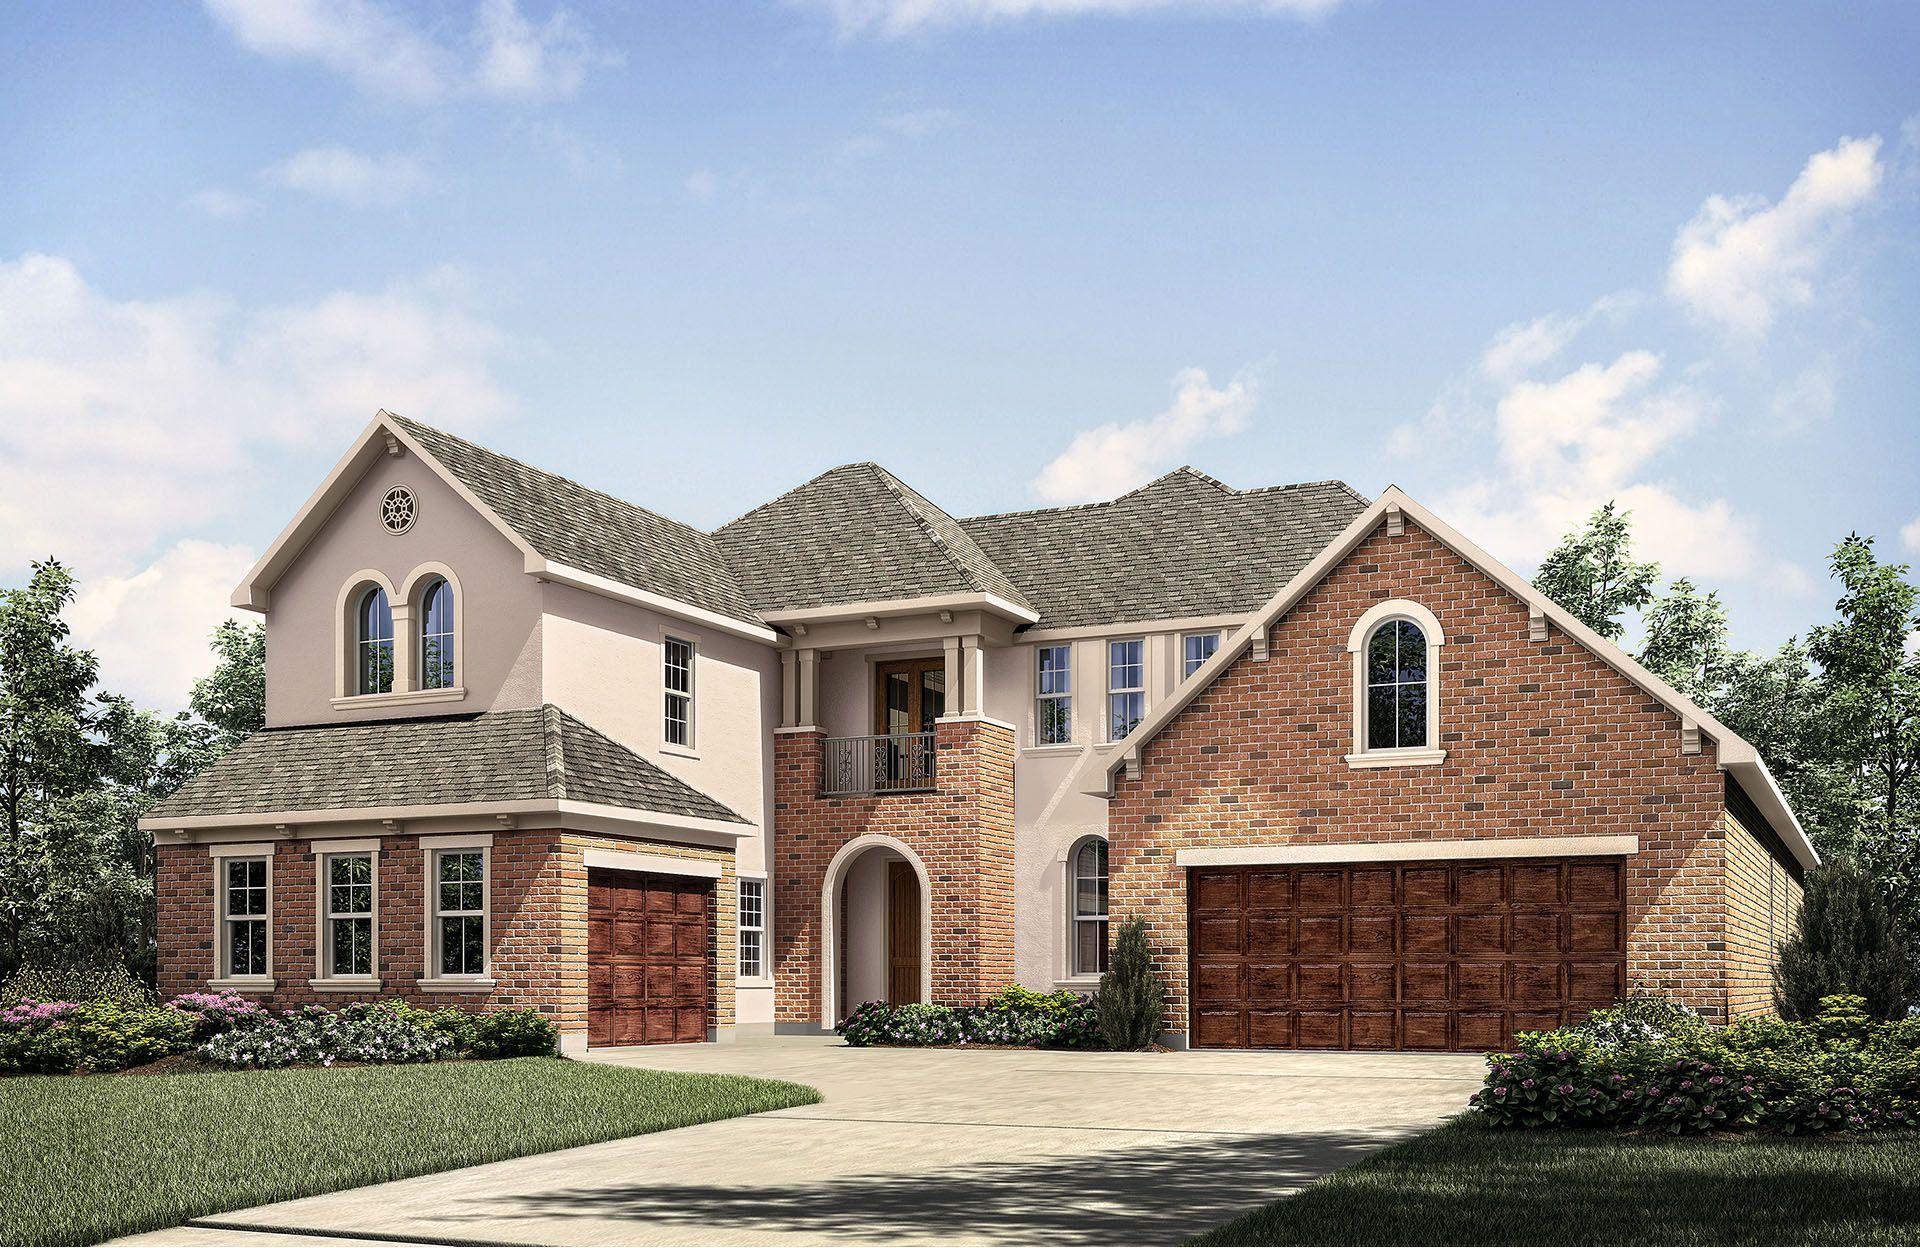 Single Family for Sale at Royal Brook At Kingwood - Antonio 3306 Lockridge Harbor Lane Porter, Texas 77365 United States